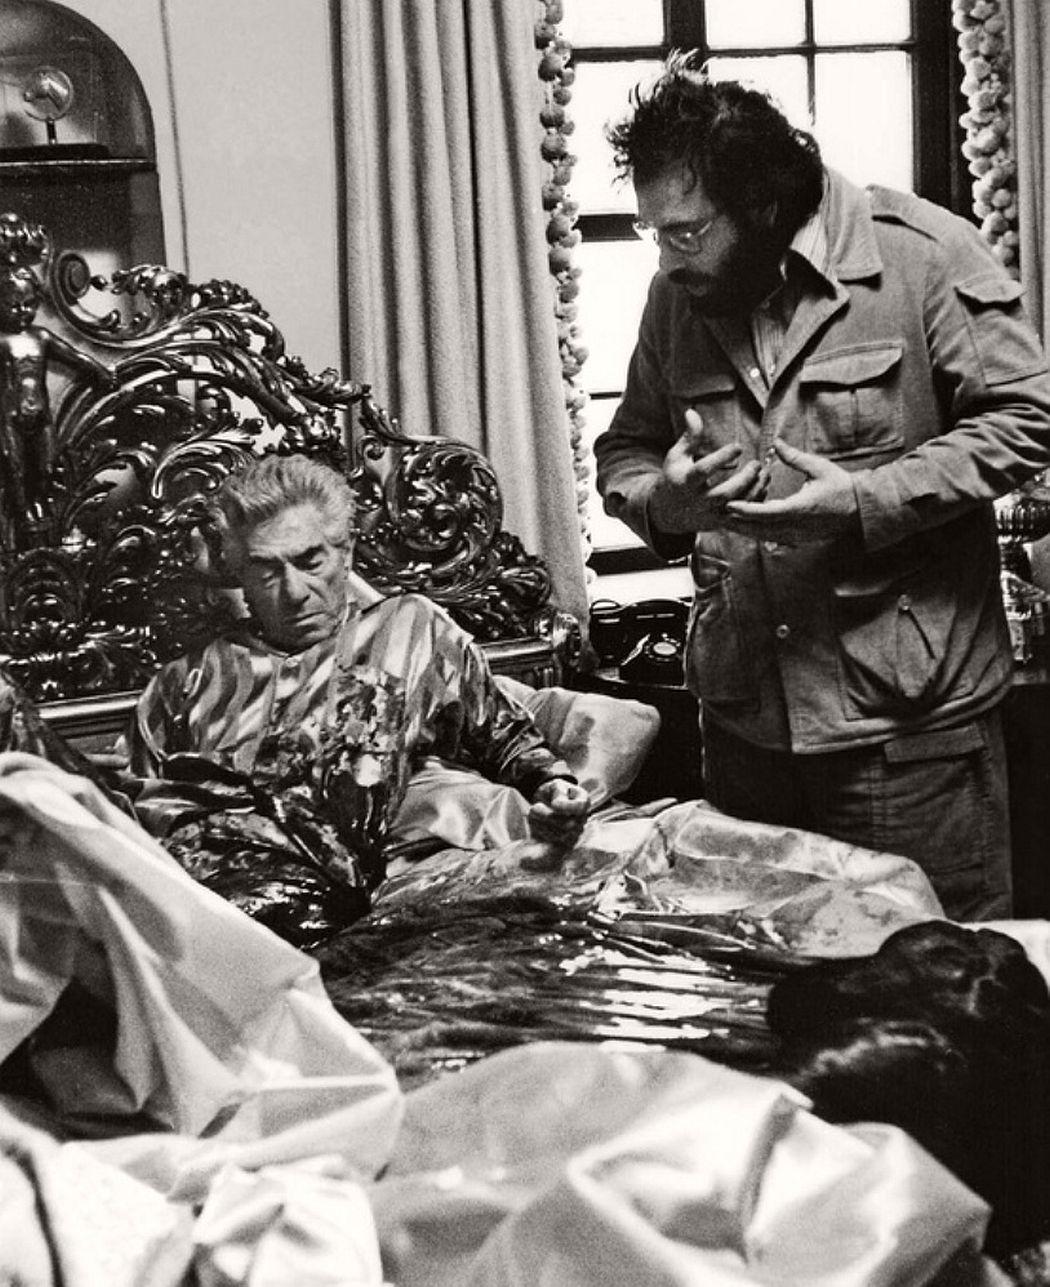 the-godfather-1972-behind-the-scenes-francis-ford-coppola-marlon-brando-al-pacino-57